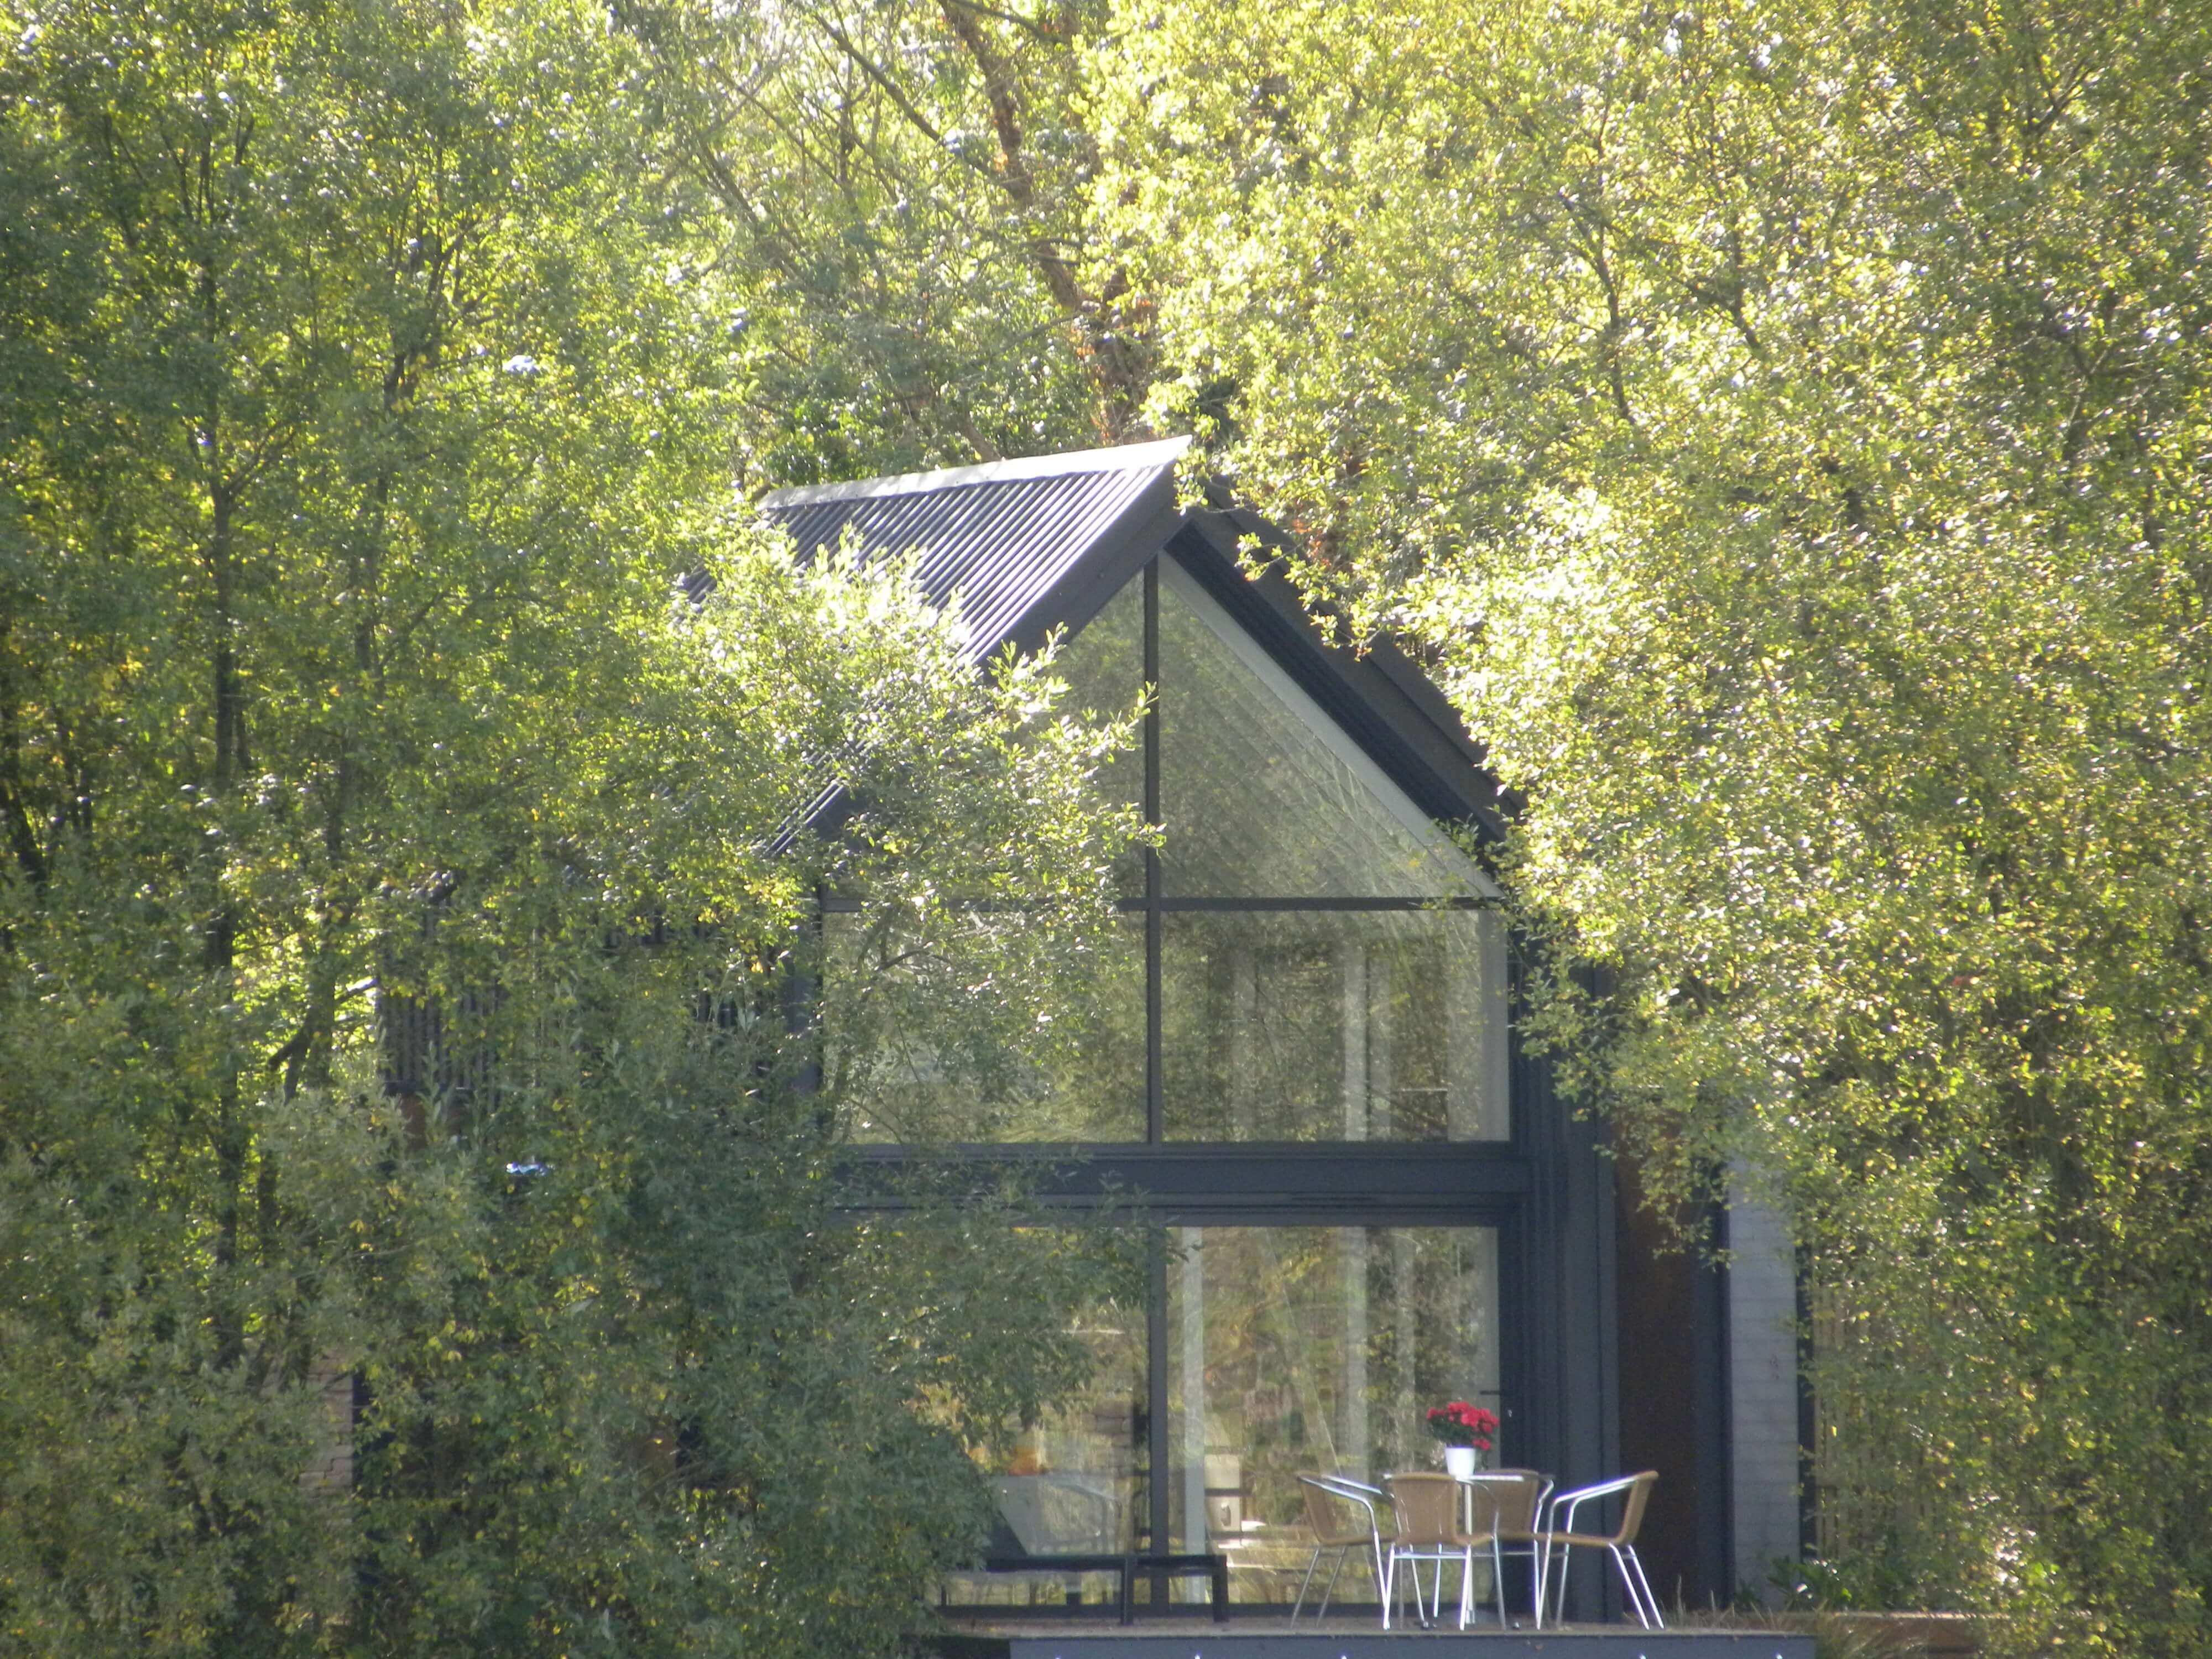 The Waterlilly Lodge - Little Horseshoe Lake Contemporary Fishing Lodges